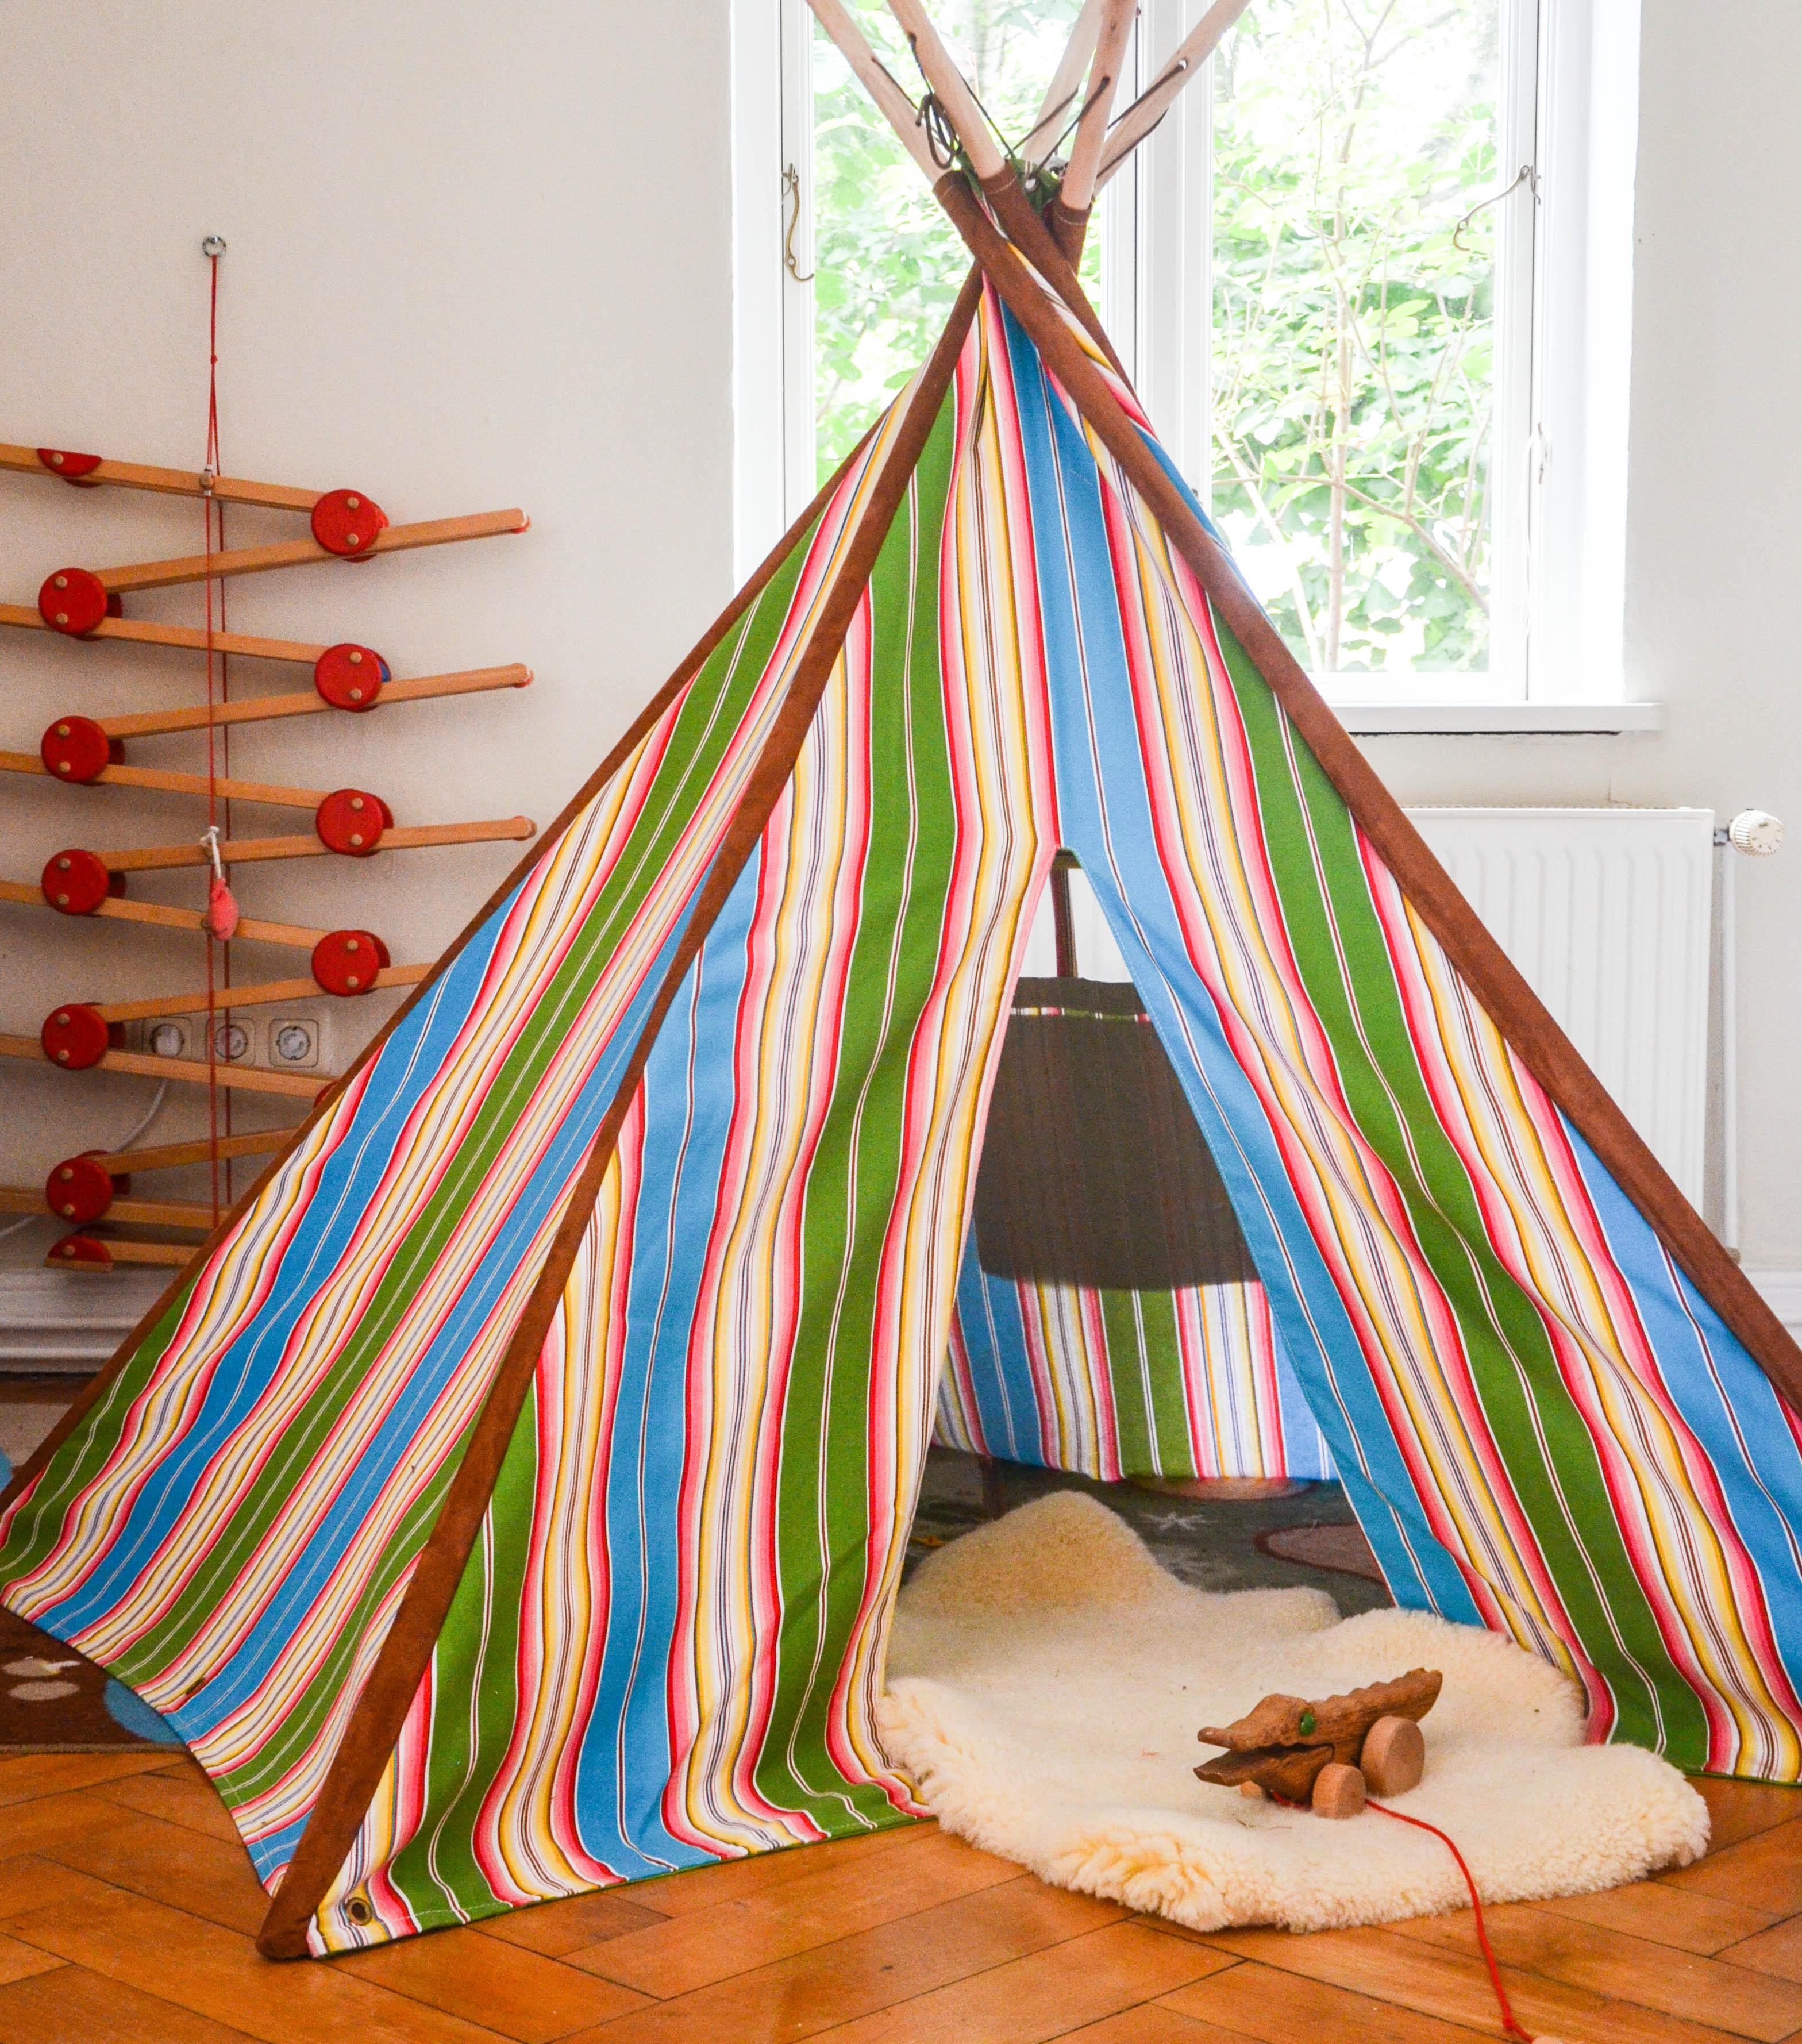 Tipi fürs Kinderzimmer